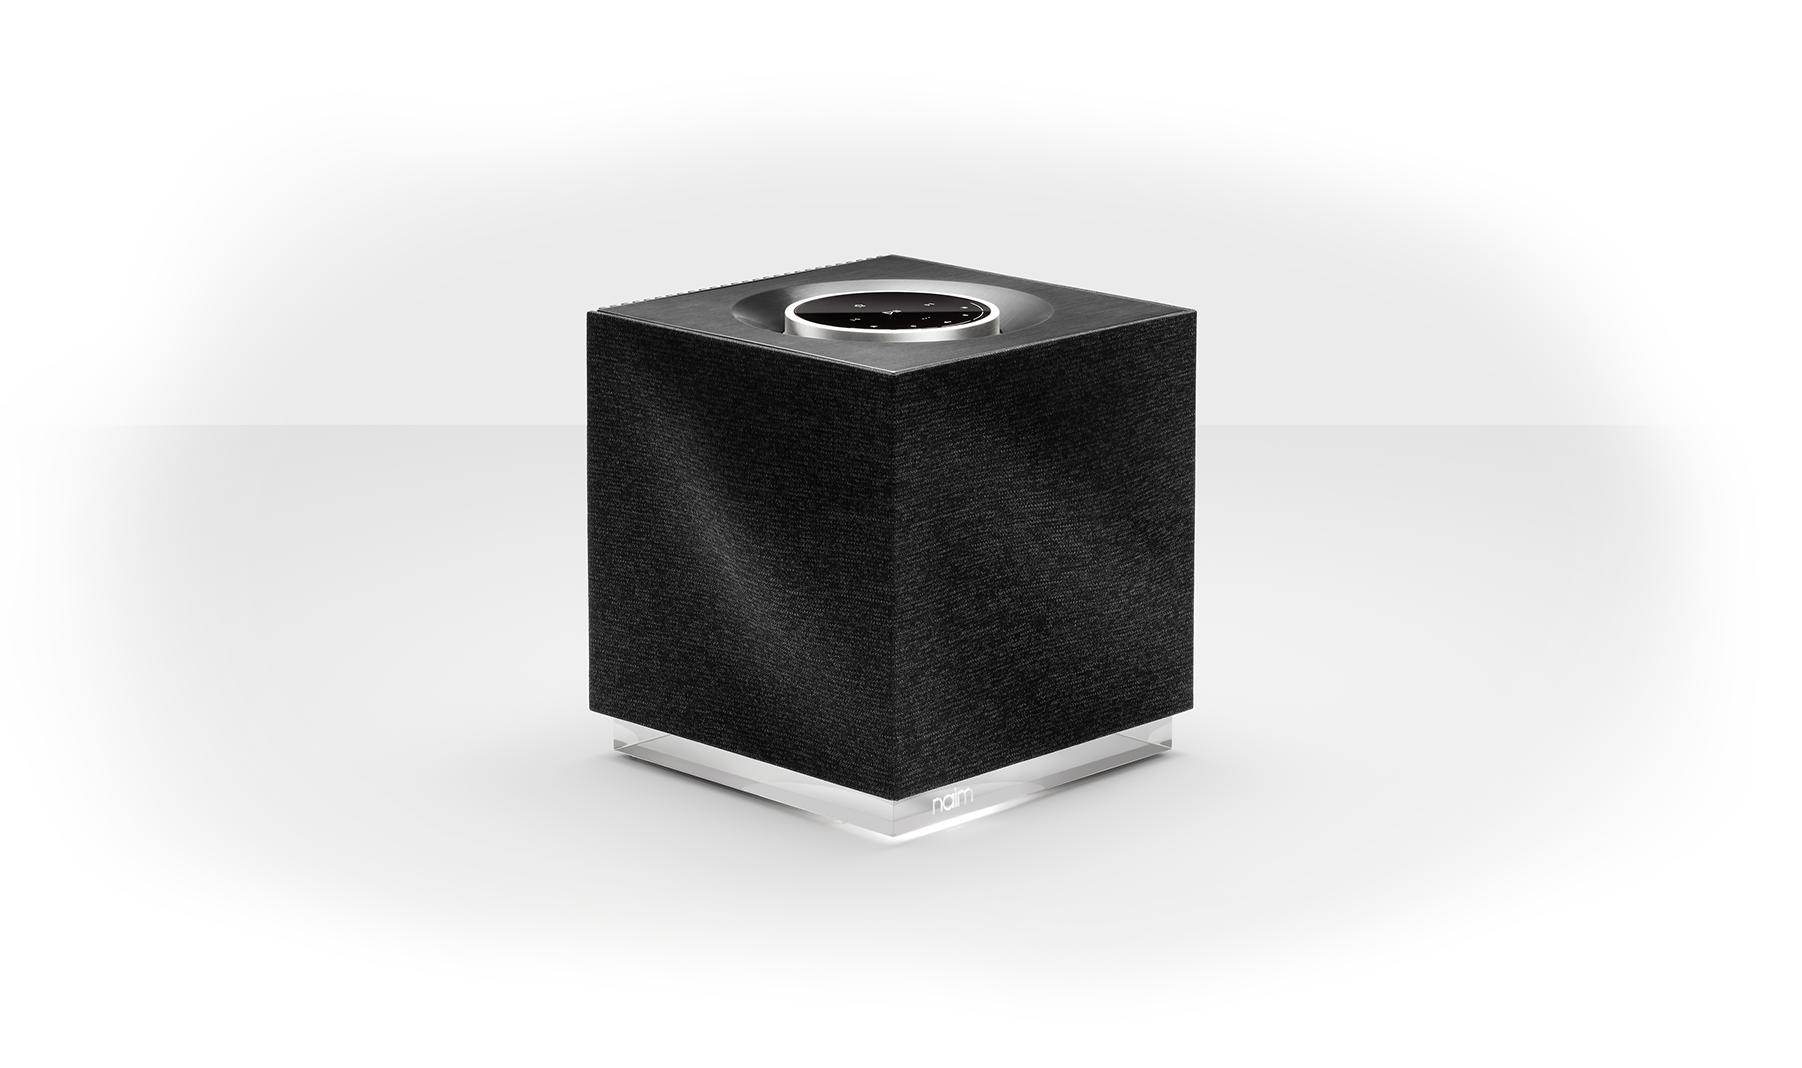 Mu-so Qb 2nd Generation | The Premium Compact Wireless